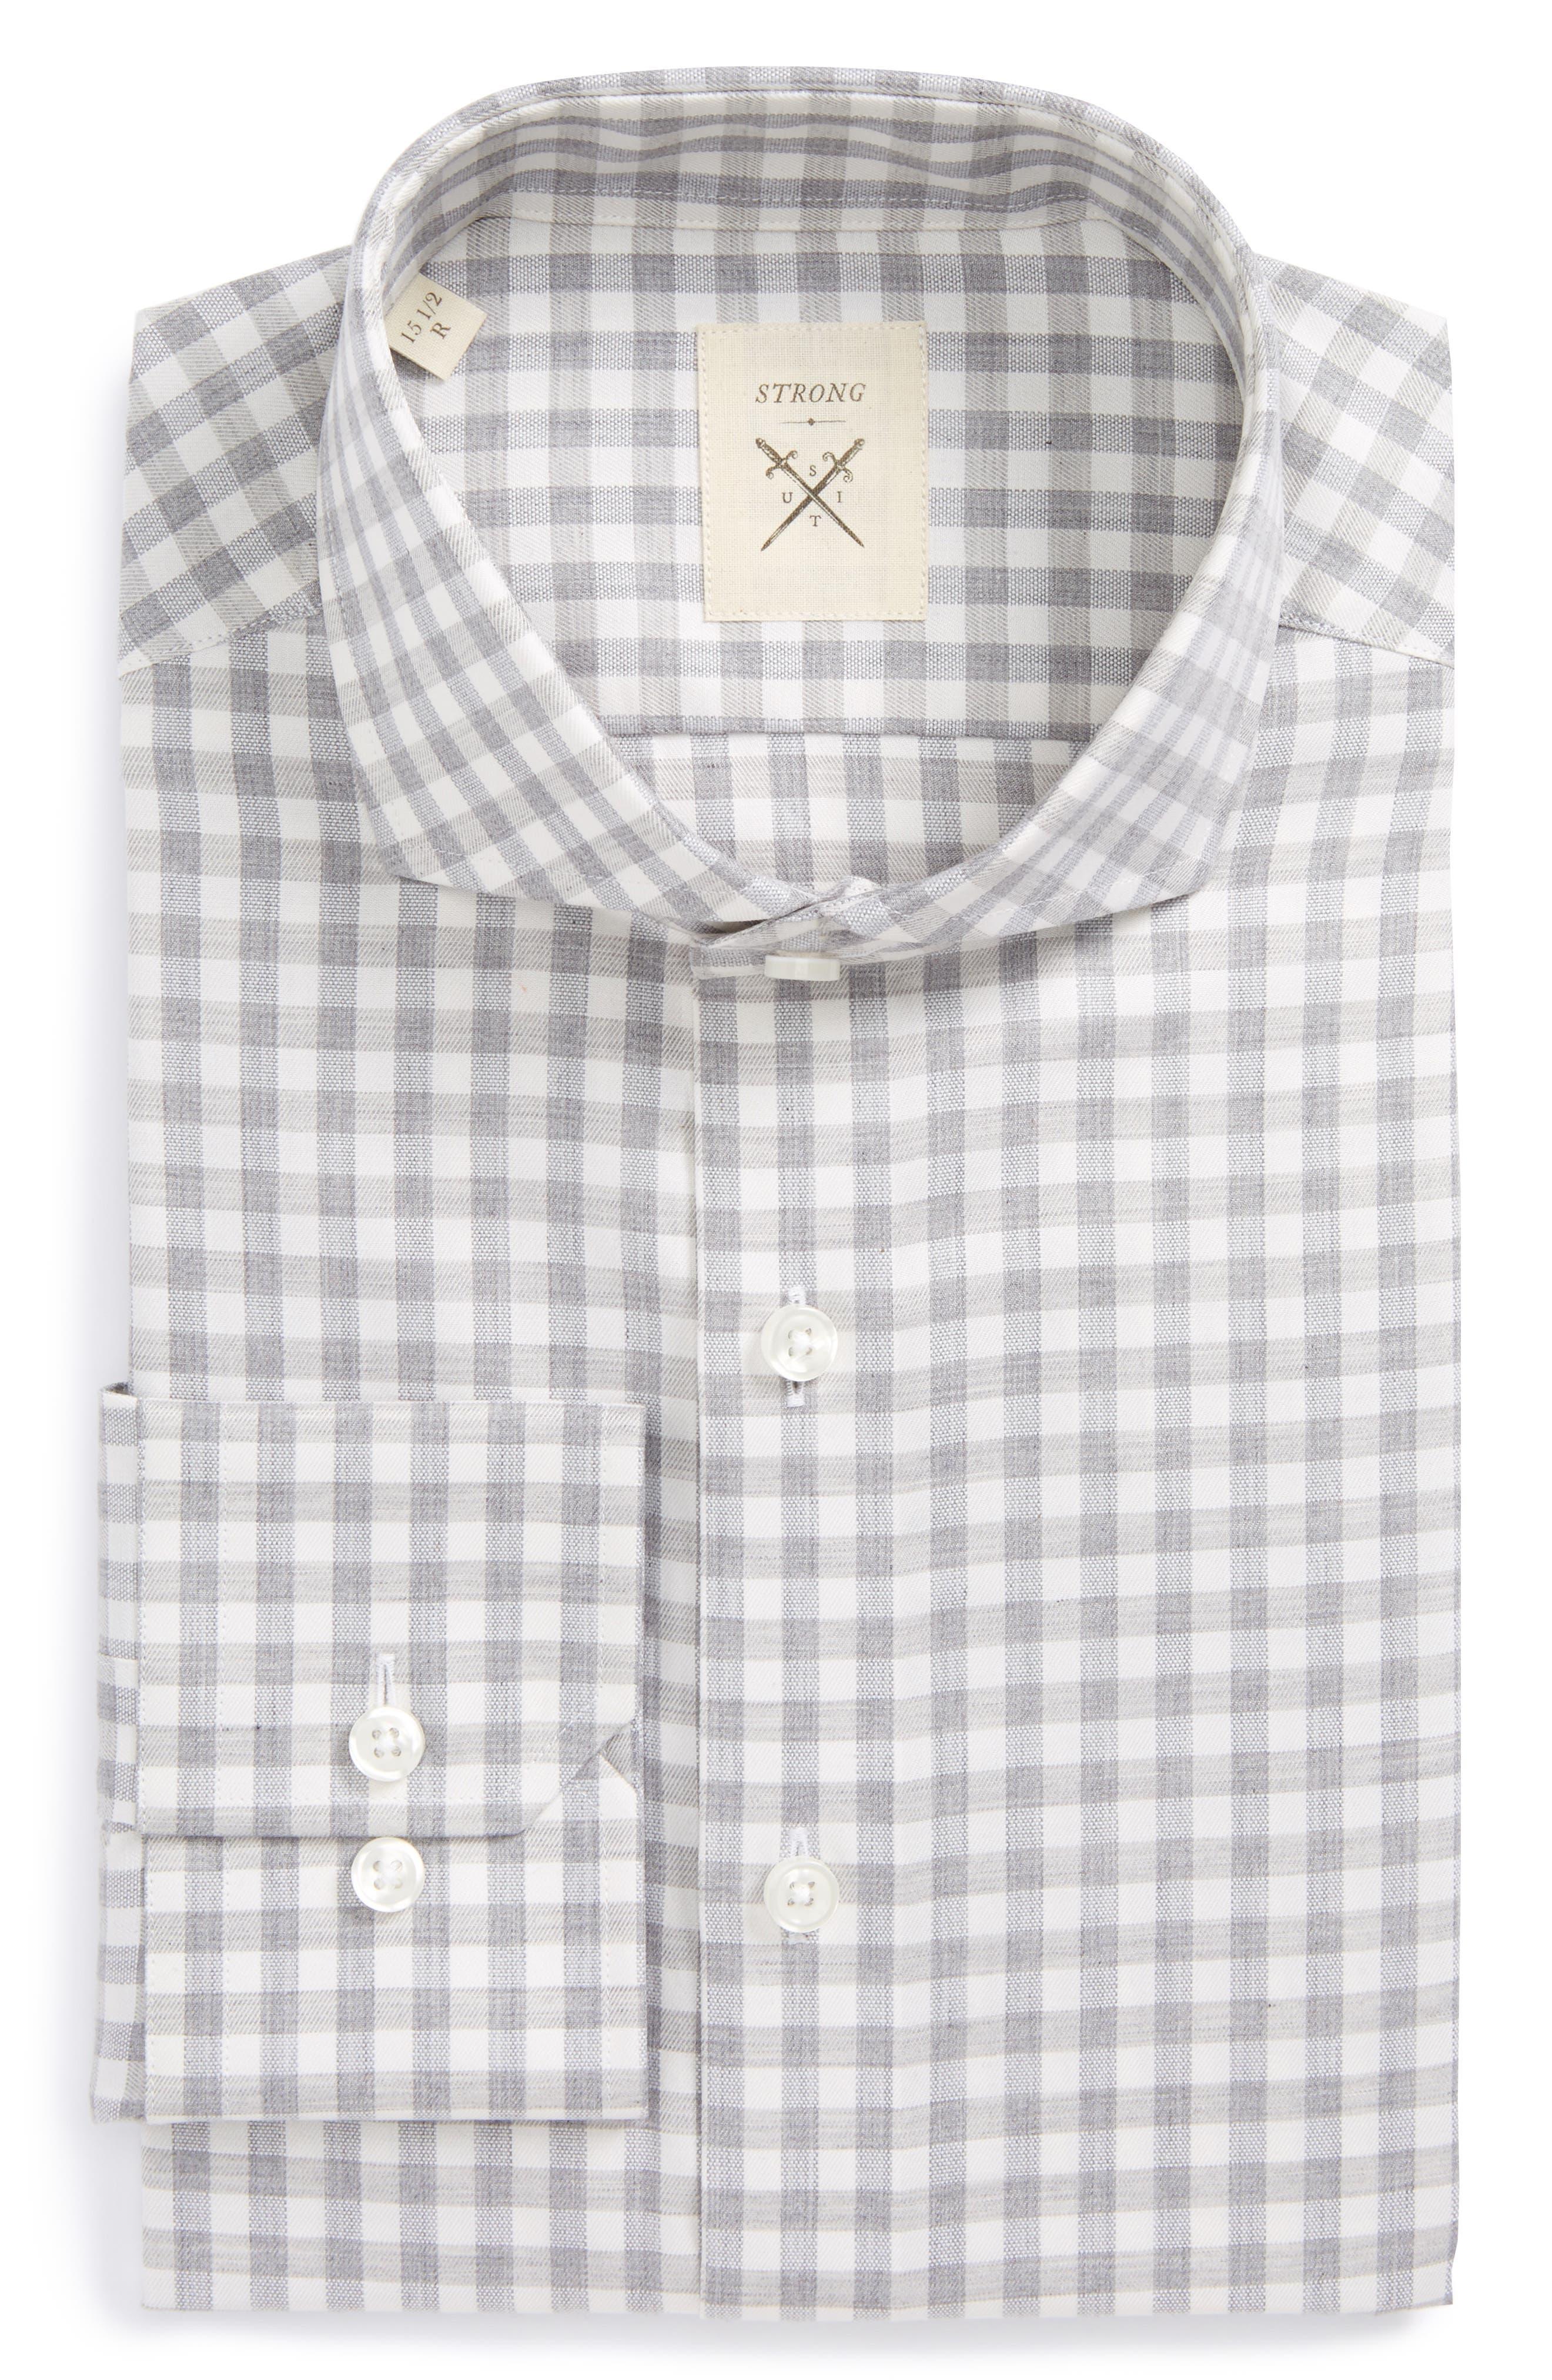 Extra Trim Fit Check Dress Shirt,                             Main thumbnail 1, color,                             034